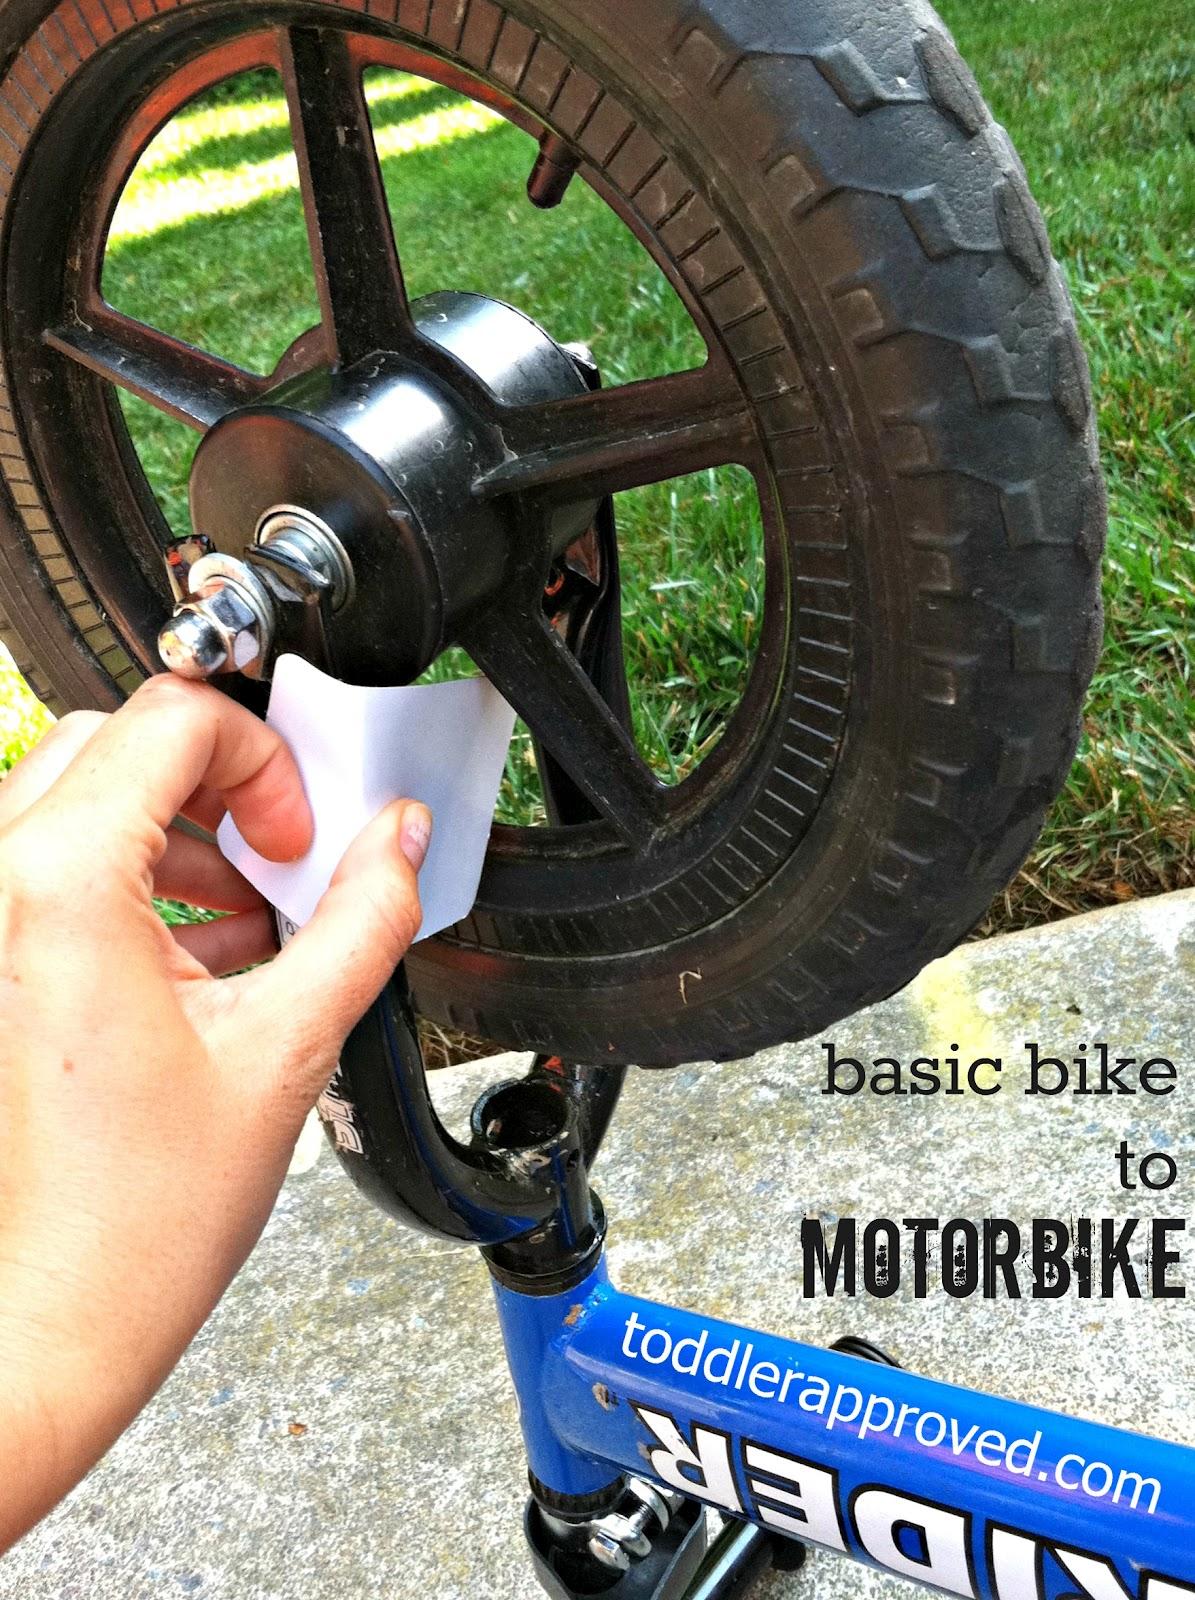 Toddler Approved Basic Bike To Motorbike